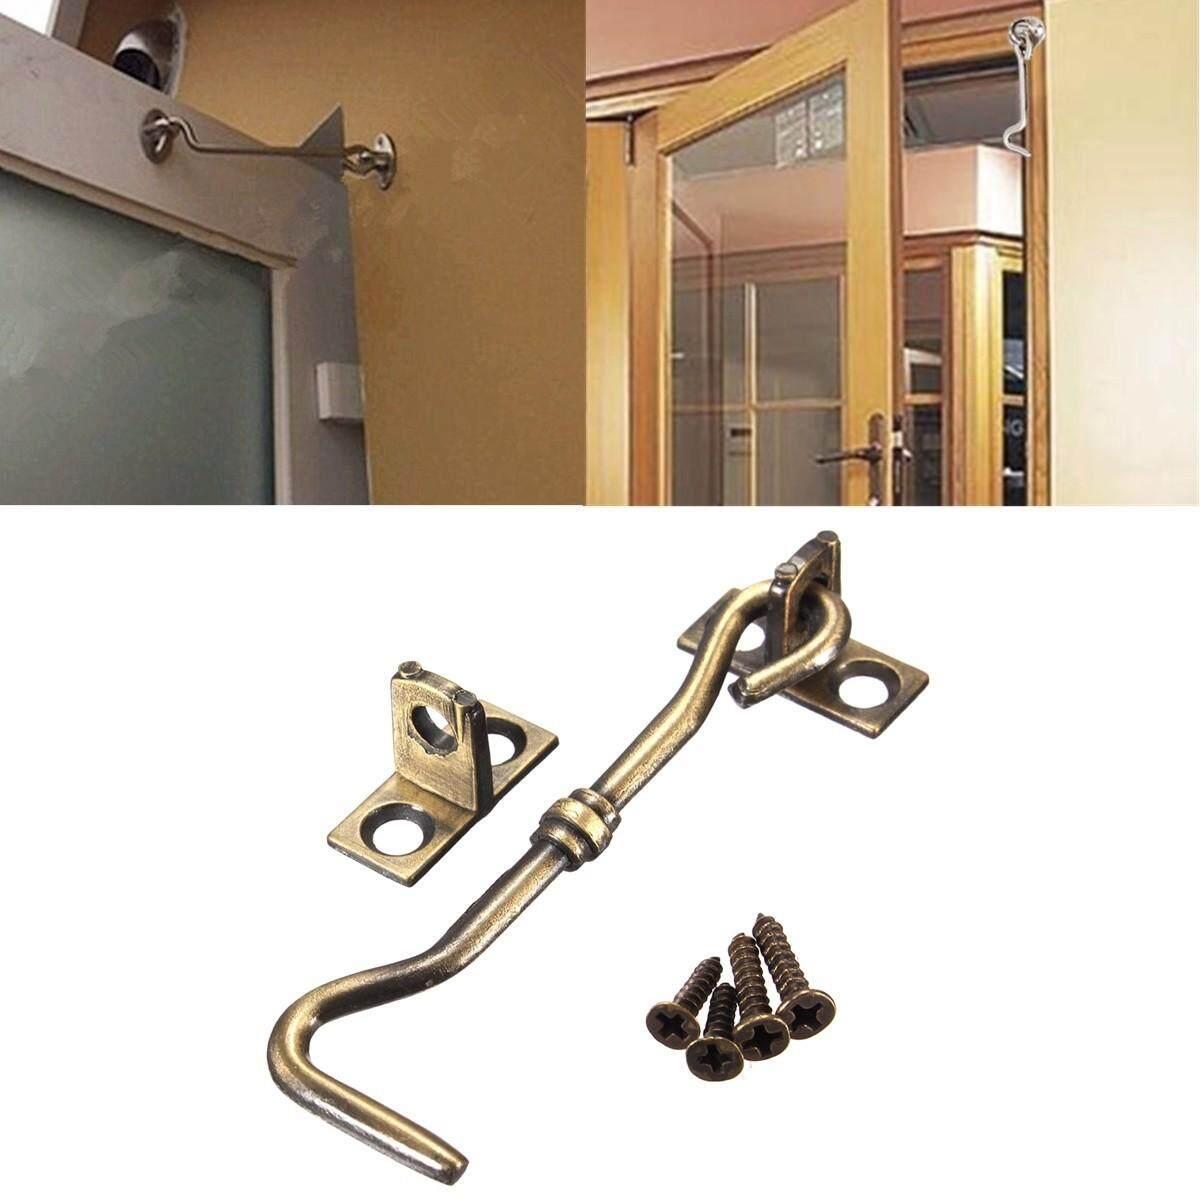 20pcs 3 Cabinet Door Showcase Holder Window Latch Hook & Eye Wind-Proof Silent Lock Bronze - intl